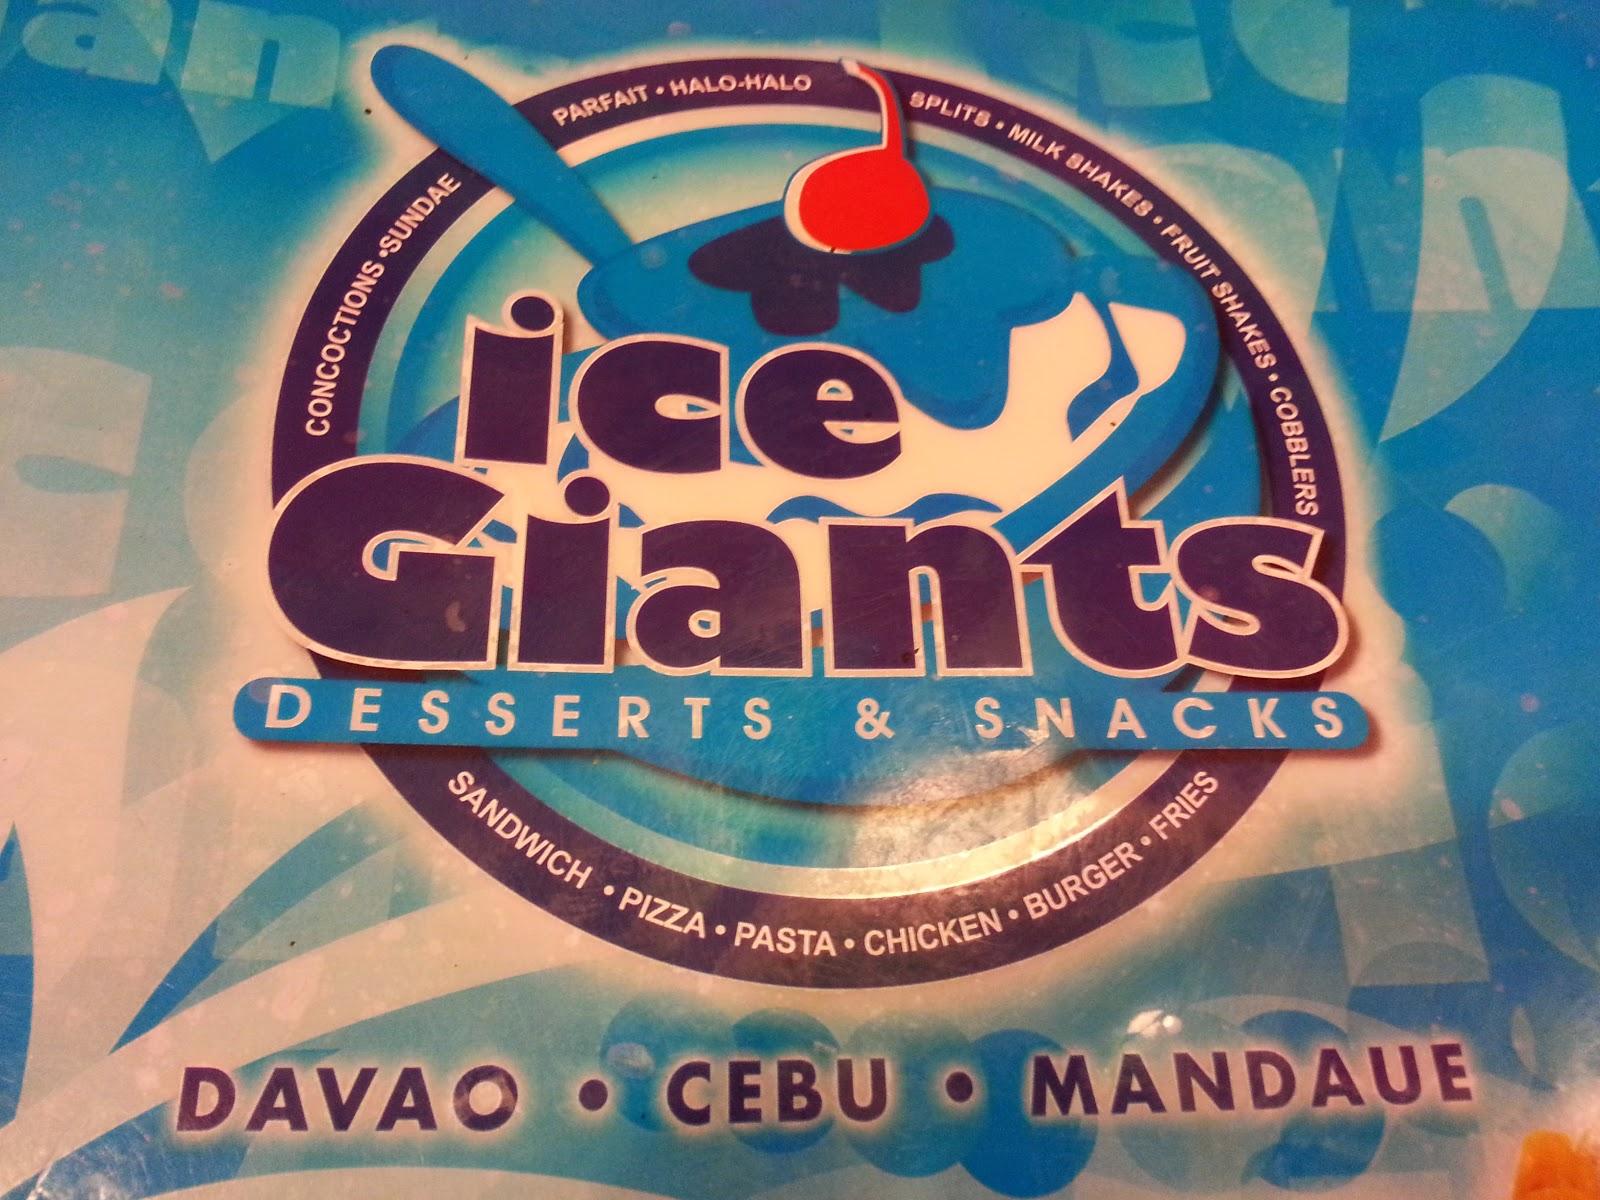 ice giants cebu menu - photo #47